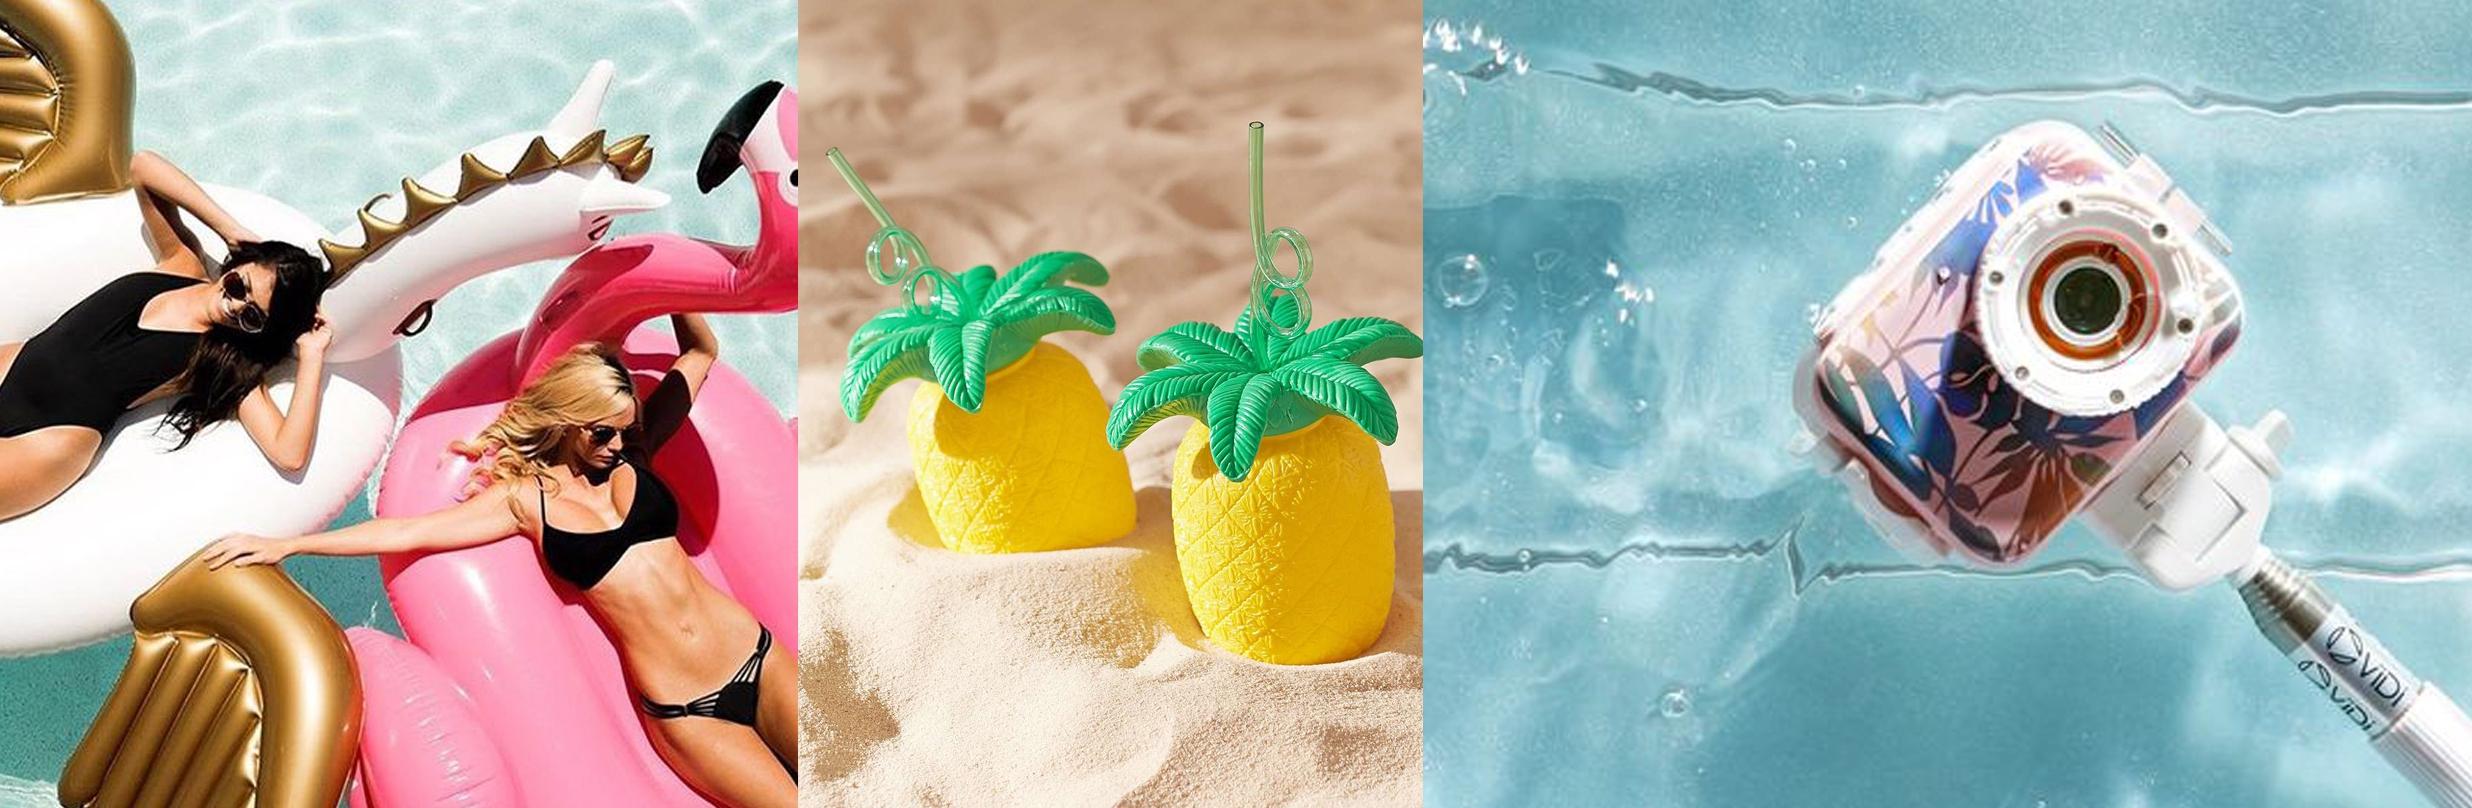 Let's go to the beach met deze 11 hippe items!